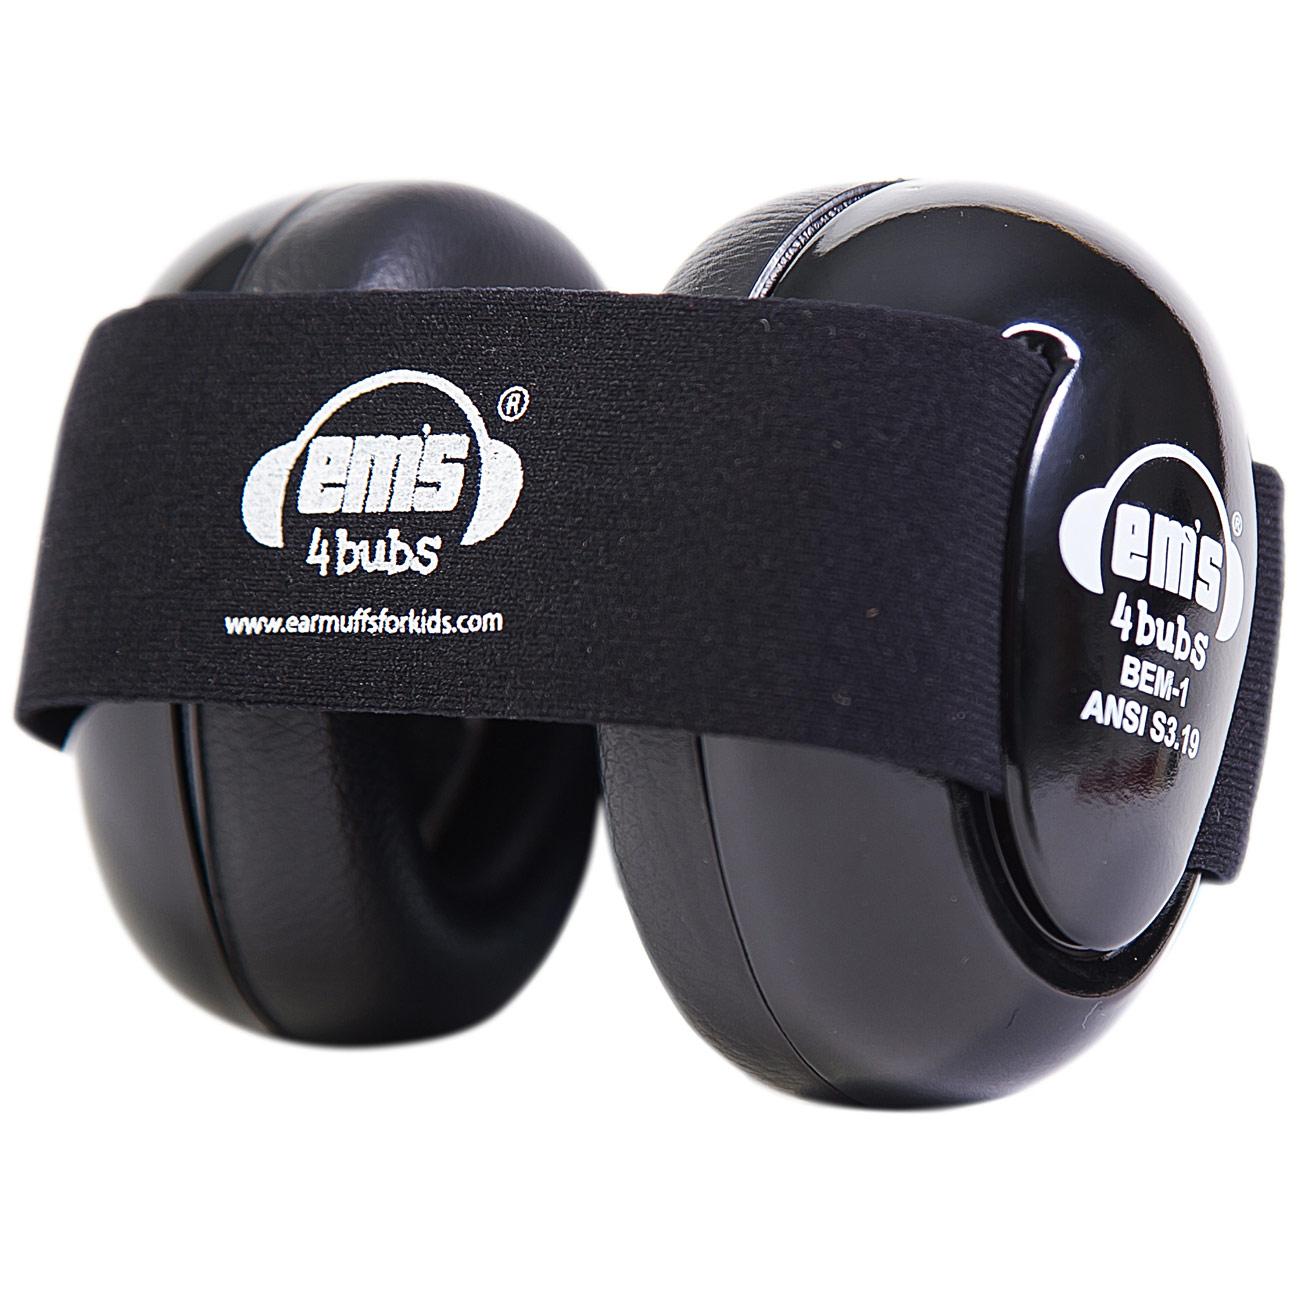 Ems 4 Bubs Baby Hearing Protection Black Earmuffs- Black